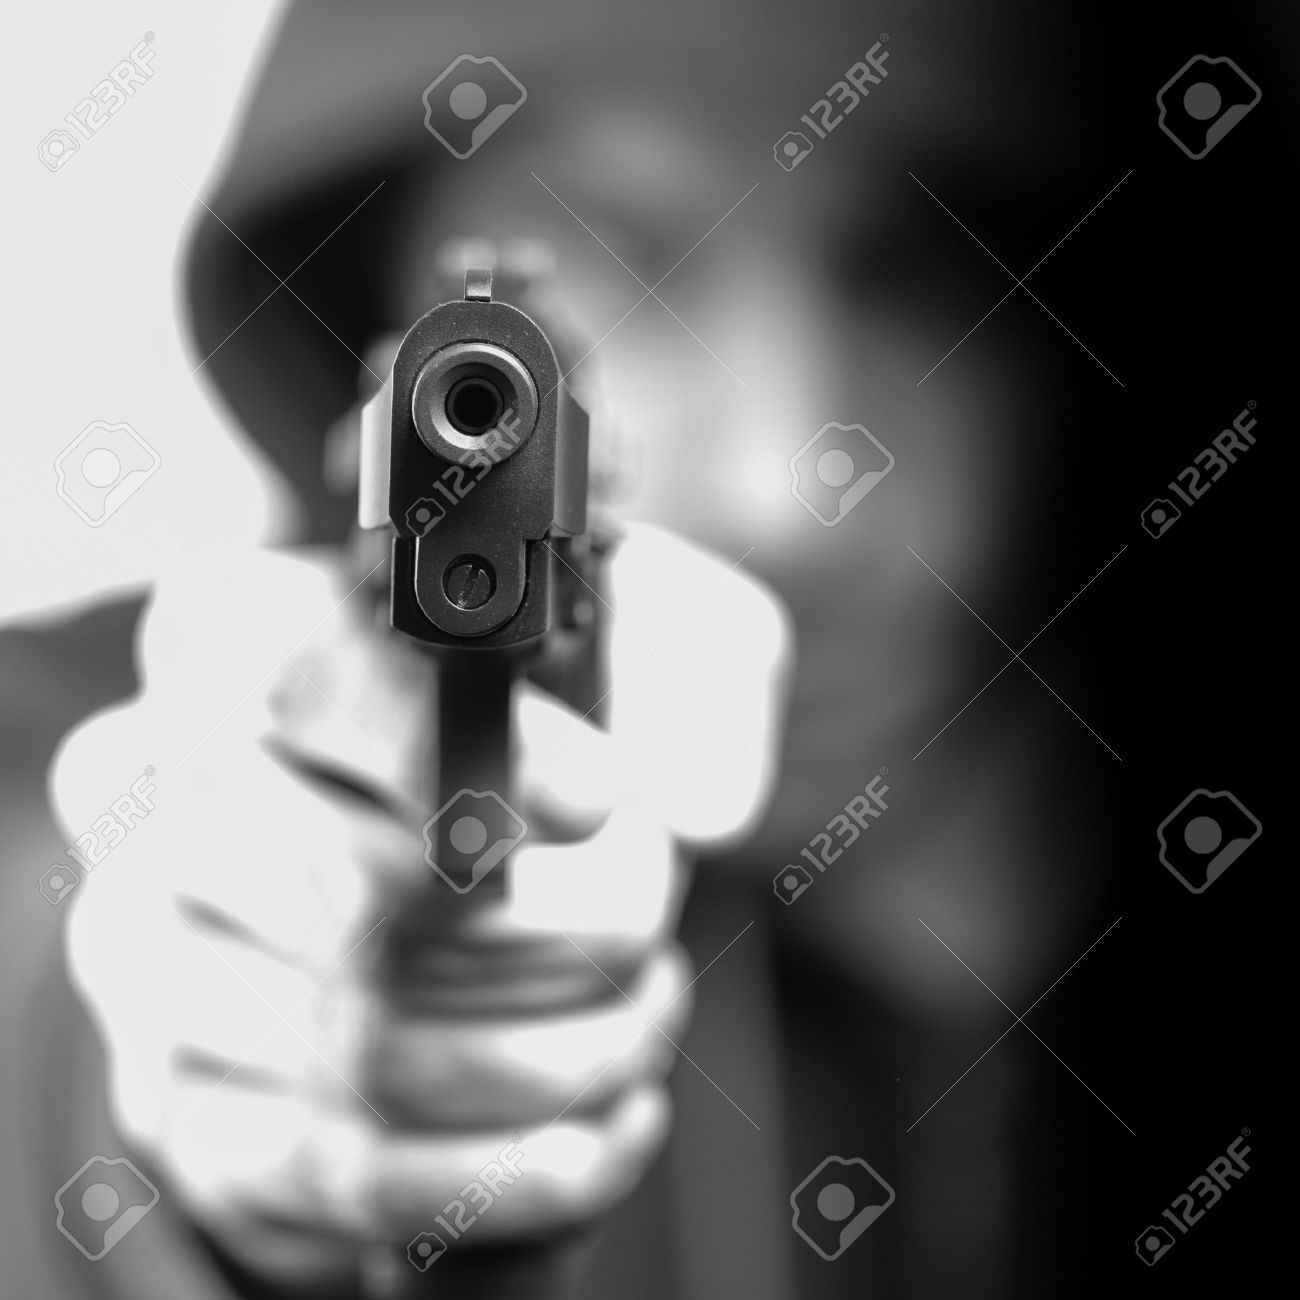 Man with gun, gangster, focus on the gun Stock Photo - 13661207